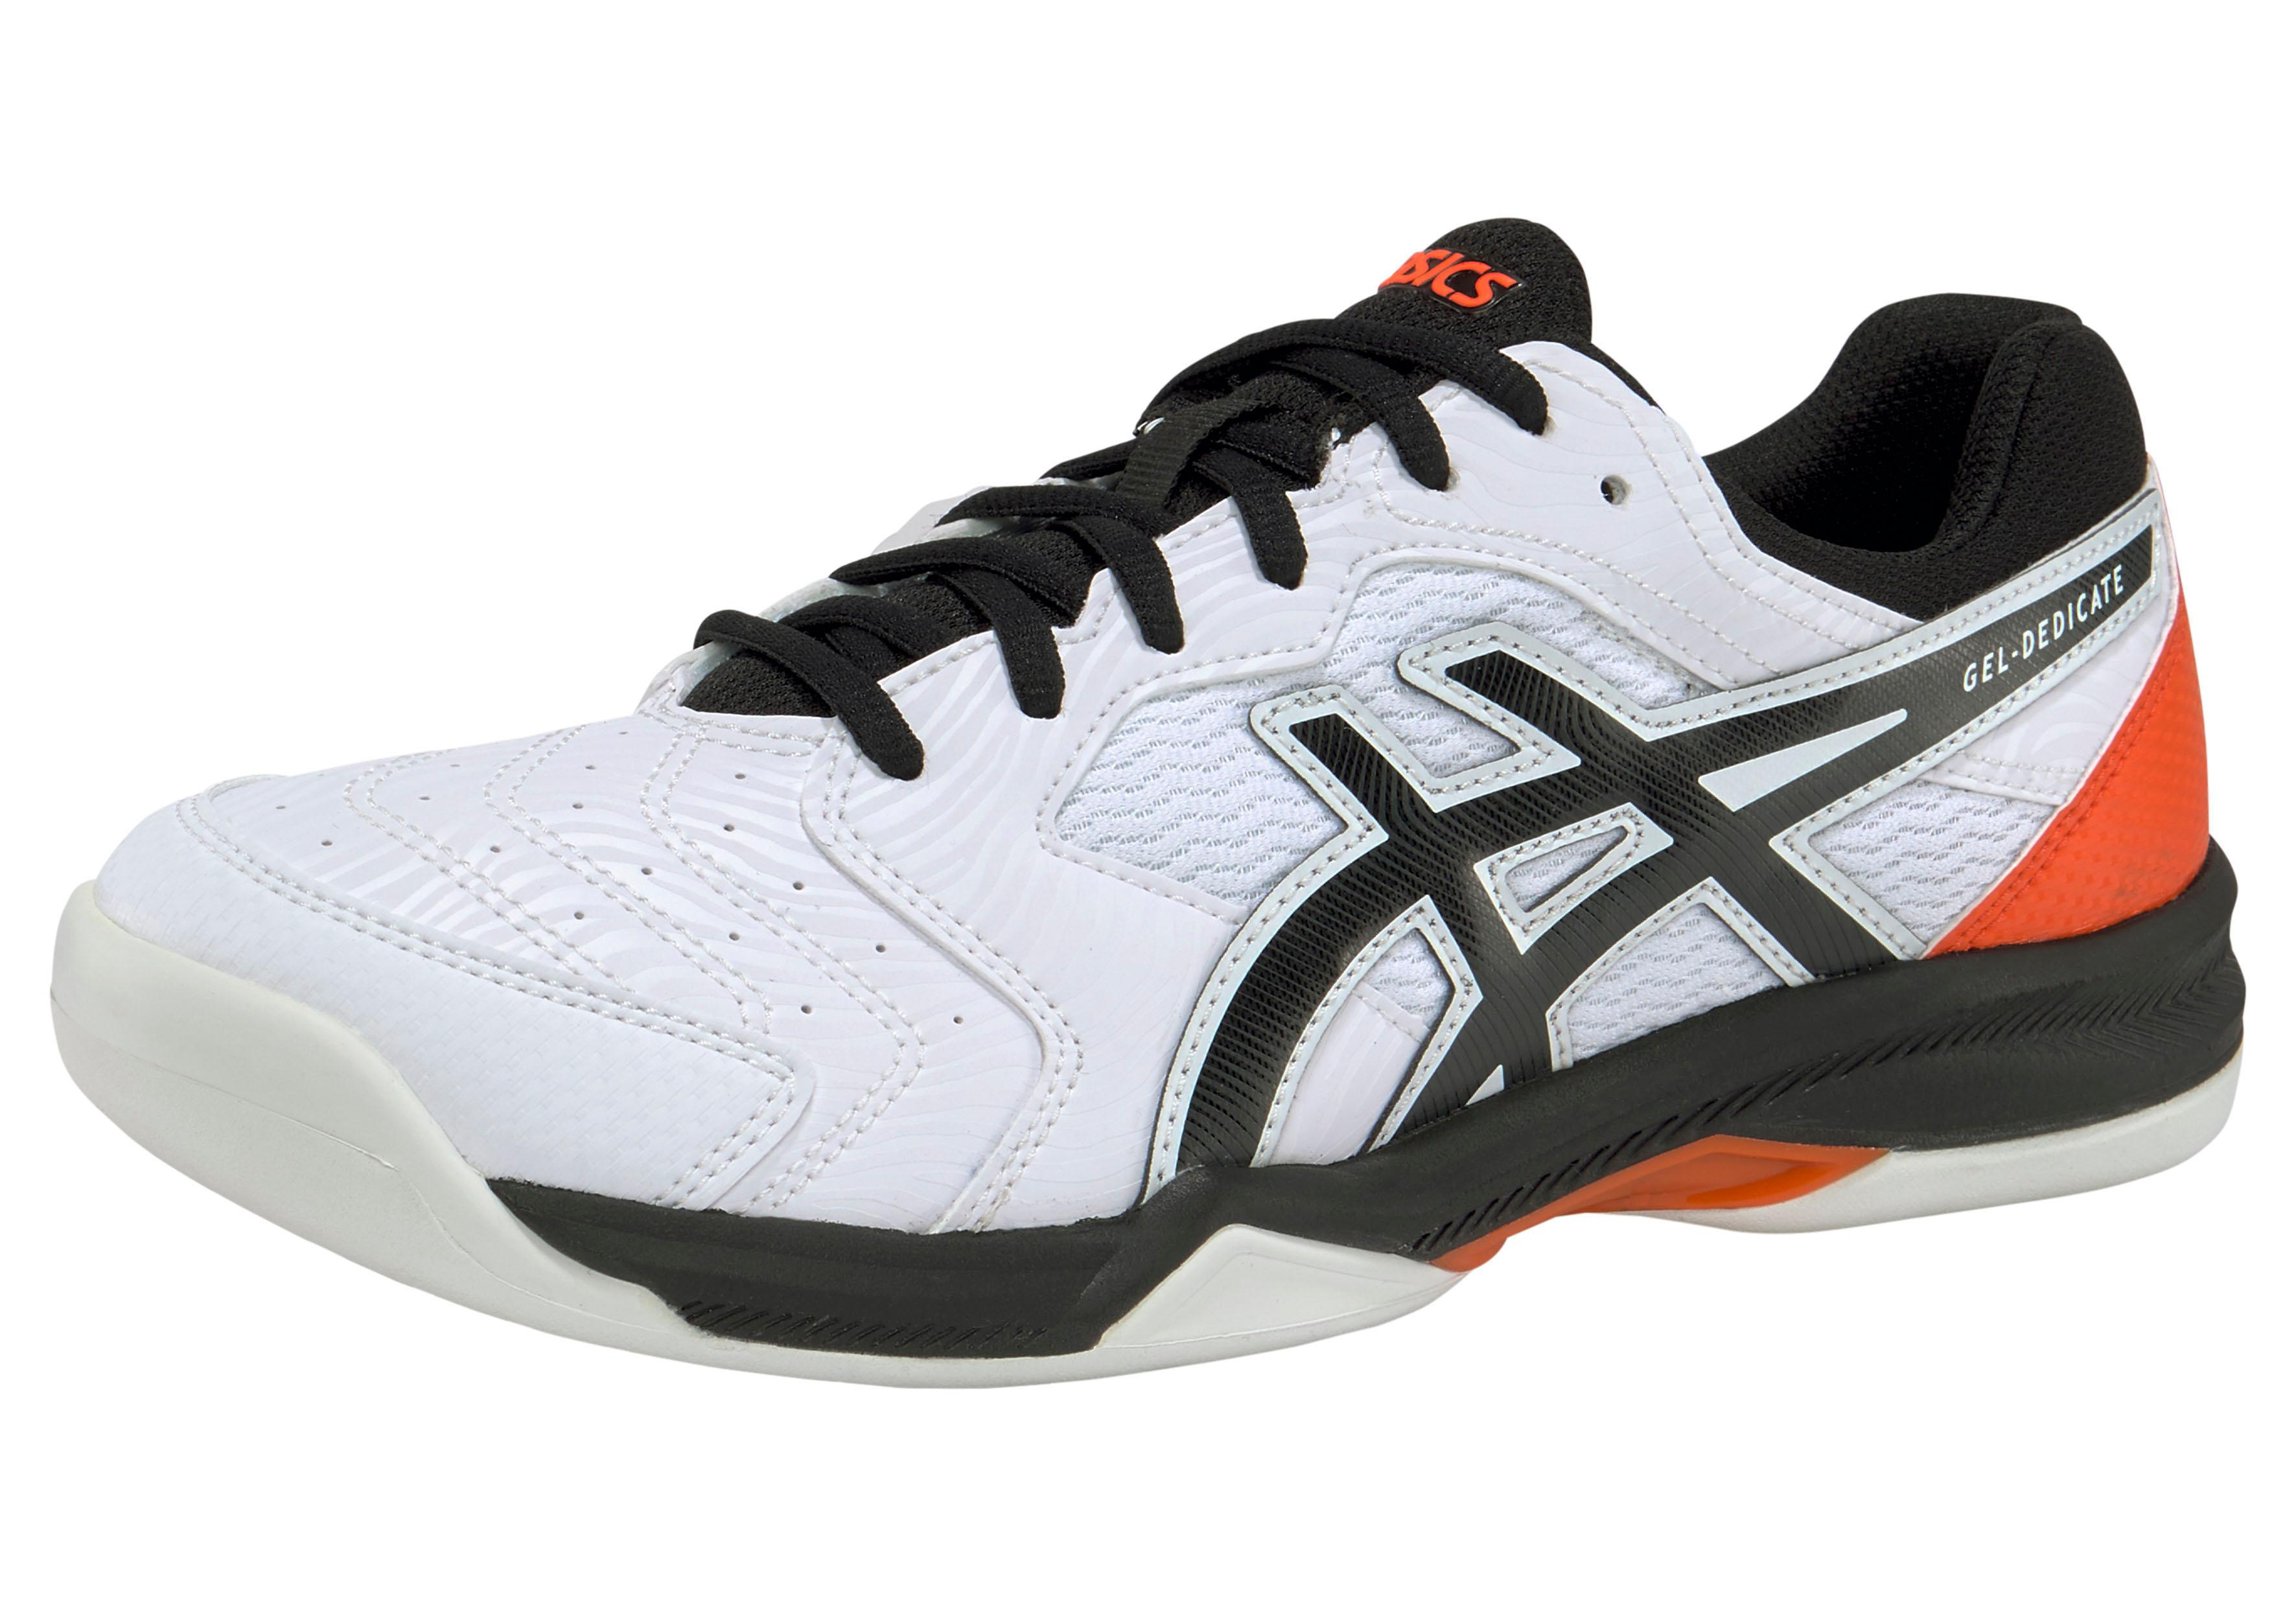 Asics Tennisschuh GEL-DEDICATE 6 INDOOR Herrenmode/Schuhe/Sportschuhe/Tennisschuhe